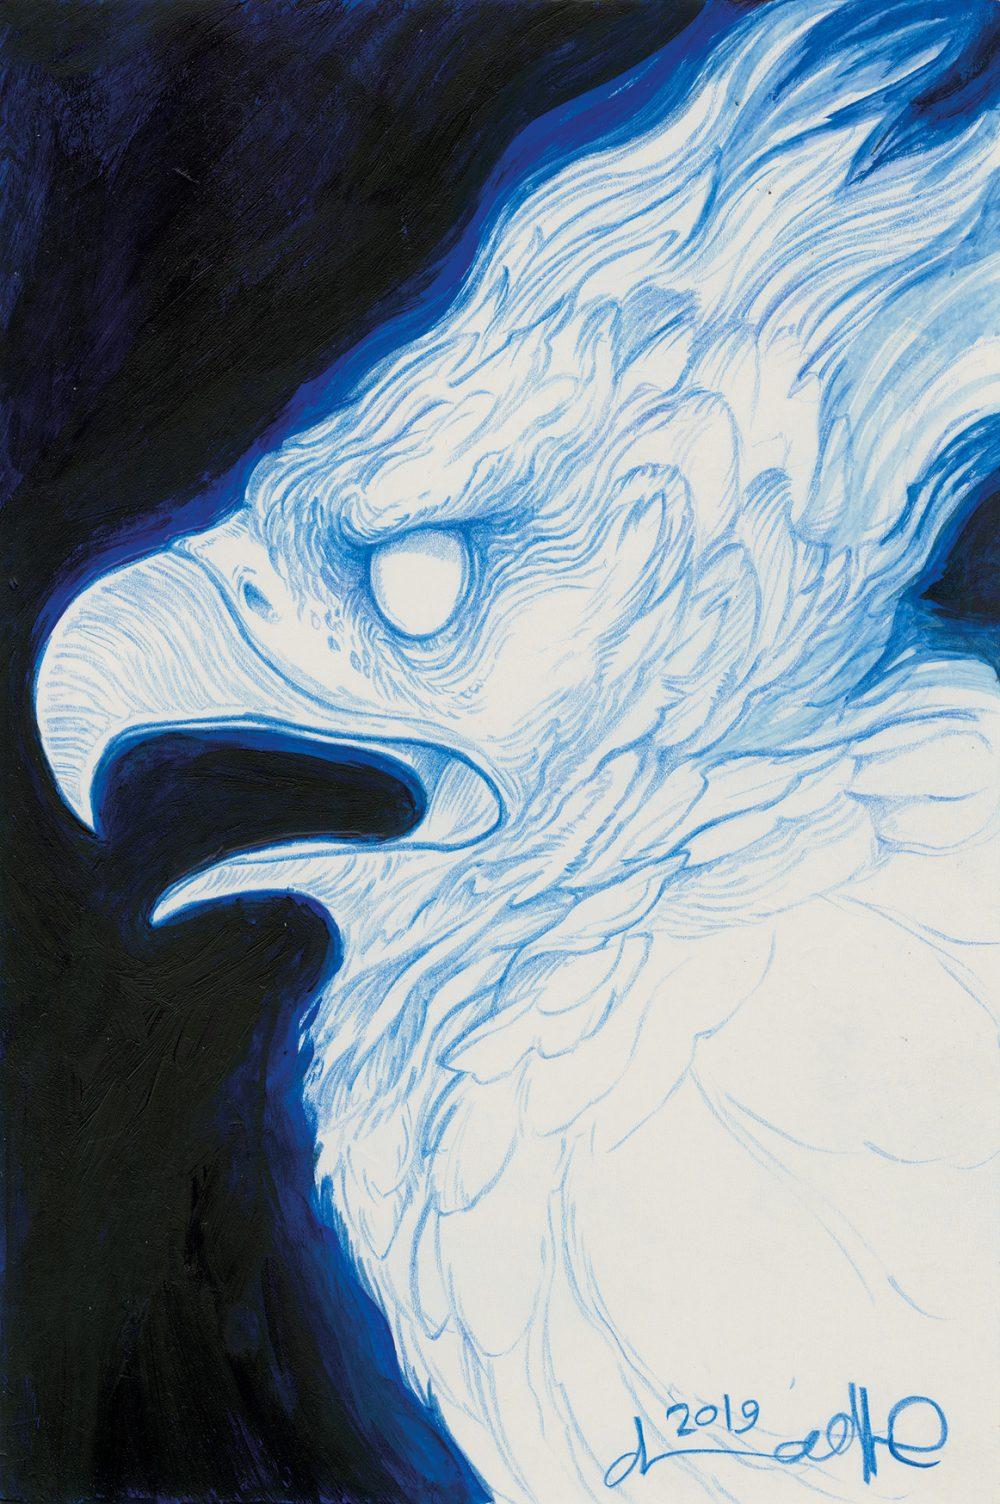 Phoenix – Jonny Duddle